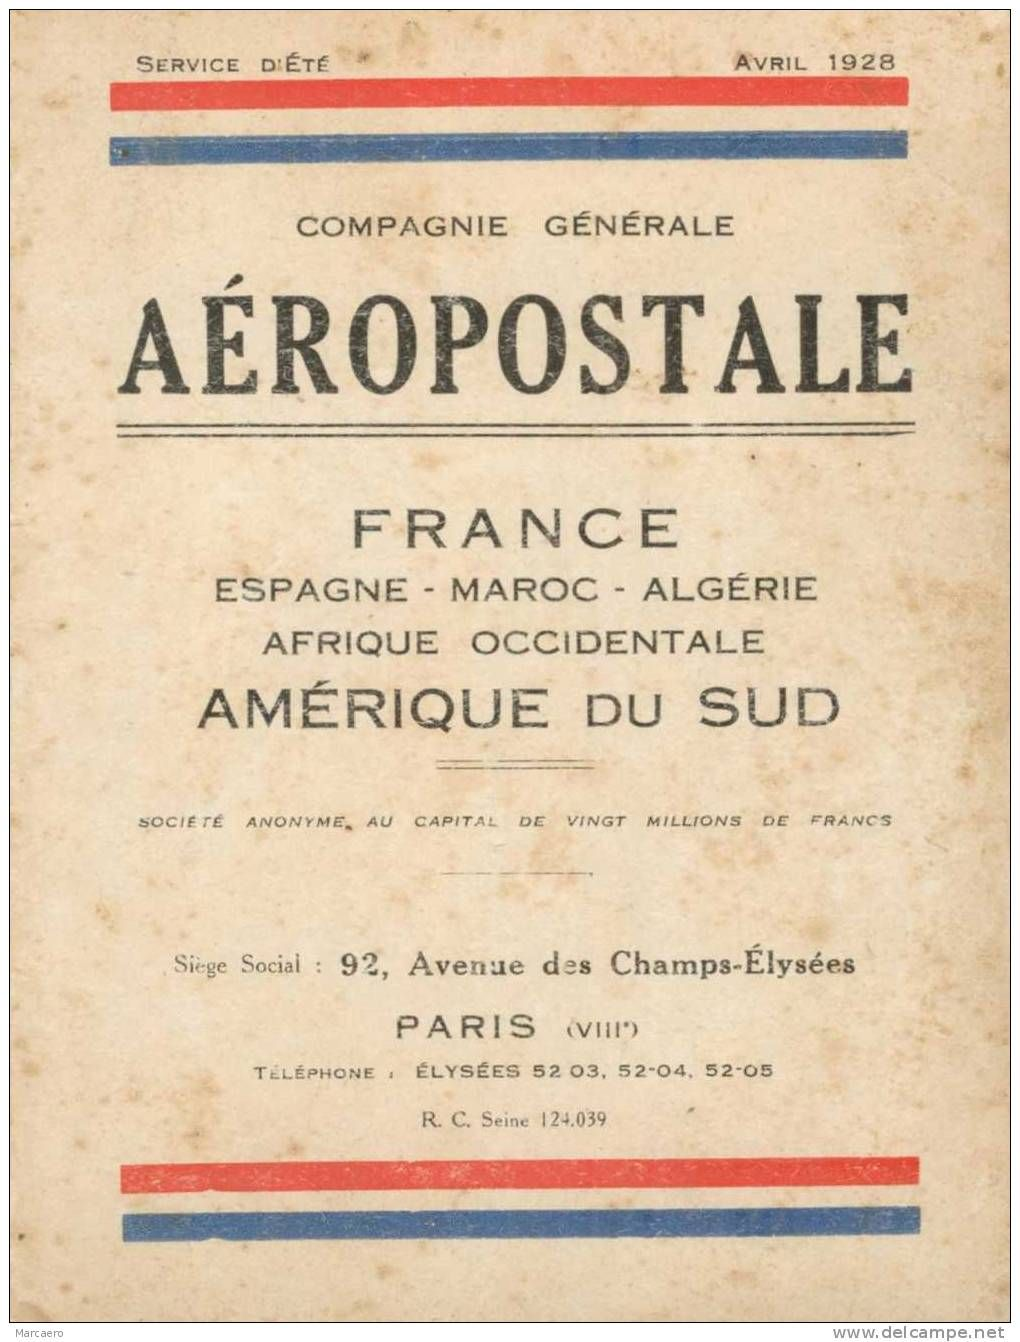 Image Aviation Compagnie Generale Aeropostale Latecoere Ligne Mermoz Aeronef Affiche De Voyage Illustration Avion